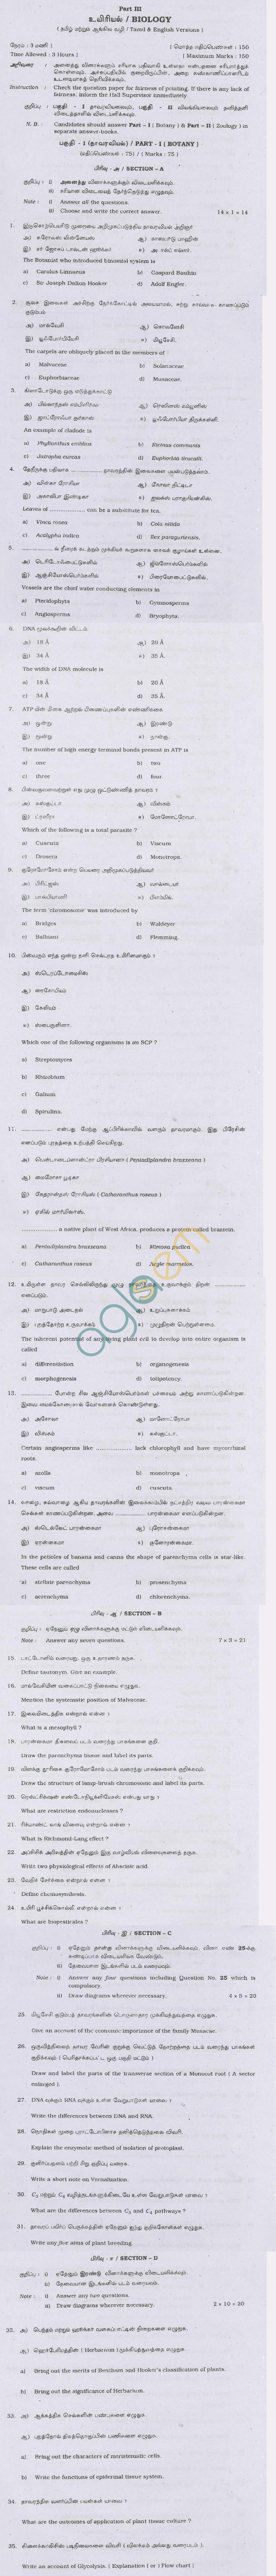 TN Board Higher Secondary (Plus 2)BiologyQuestion PapersJune 2011